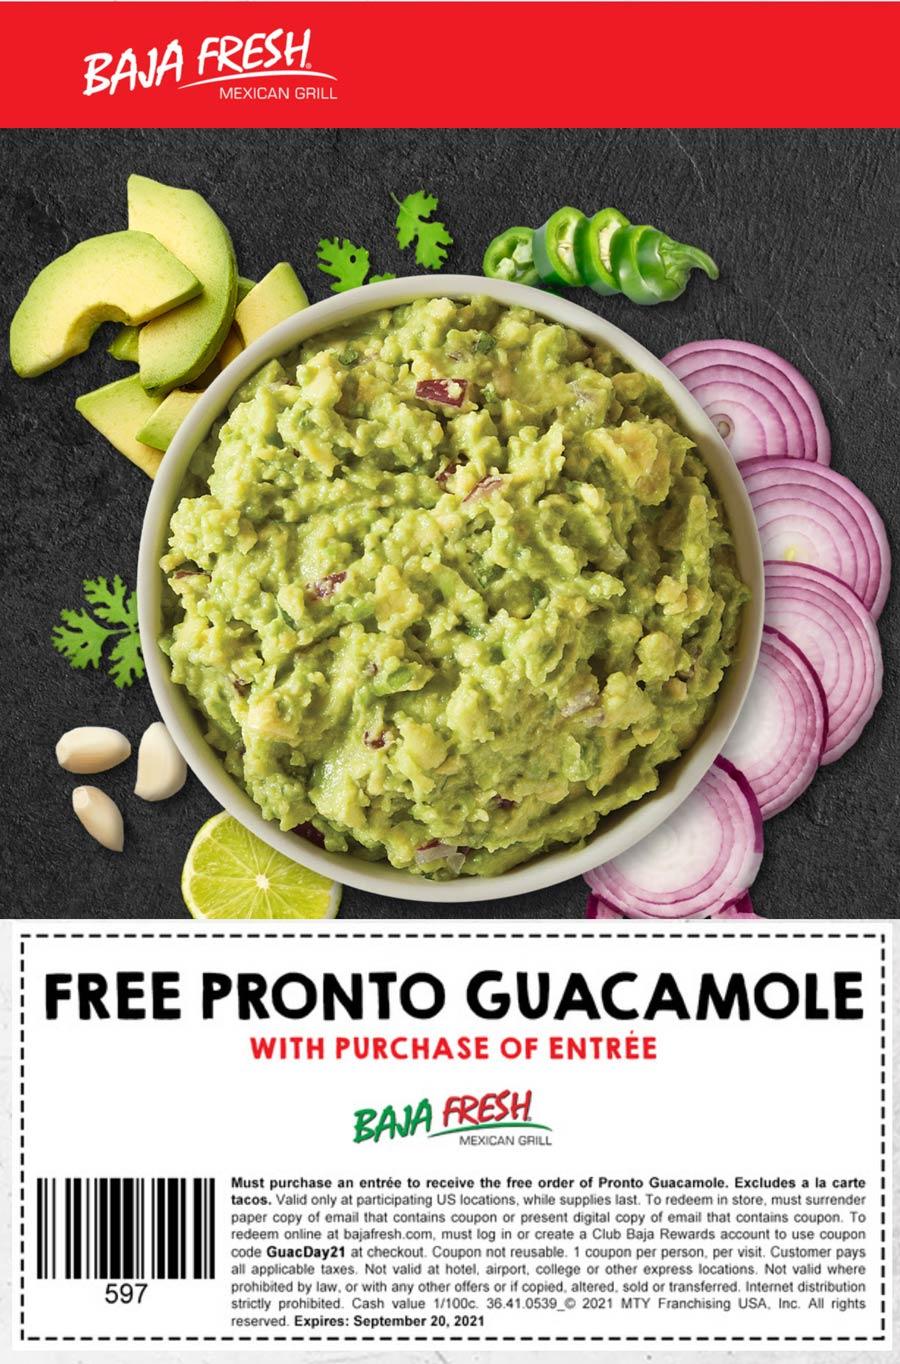 Baja Fresh restaurants Coupon  Free guacamole with your entree at Baja Fresh via promo code GuacDay21 #bajafresh